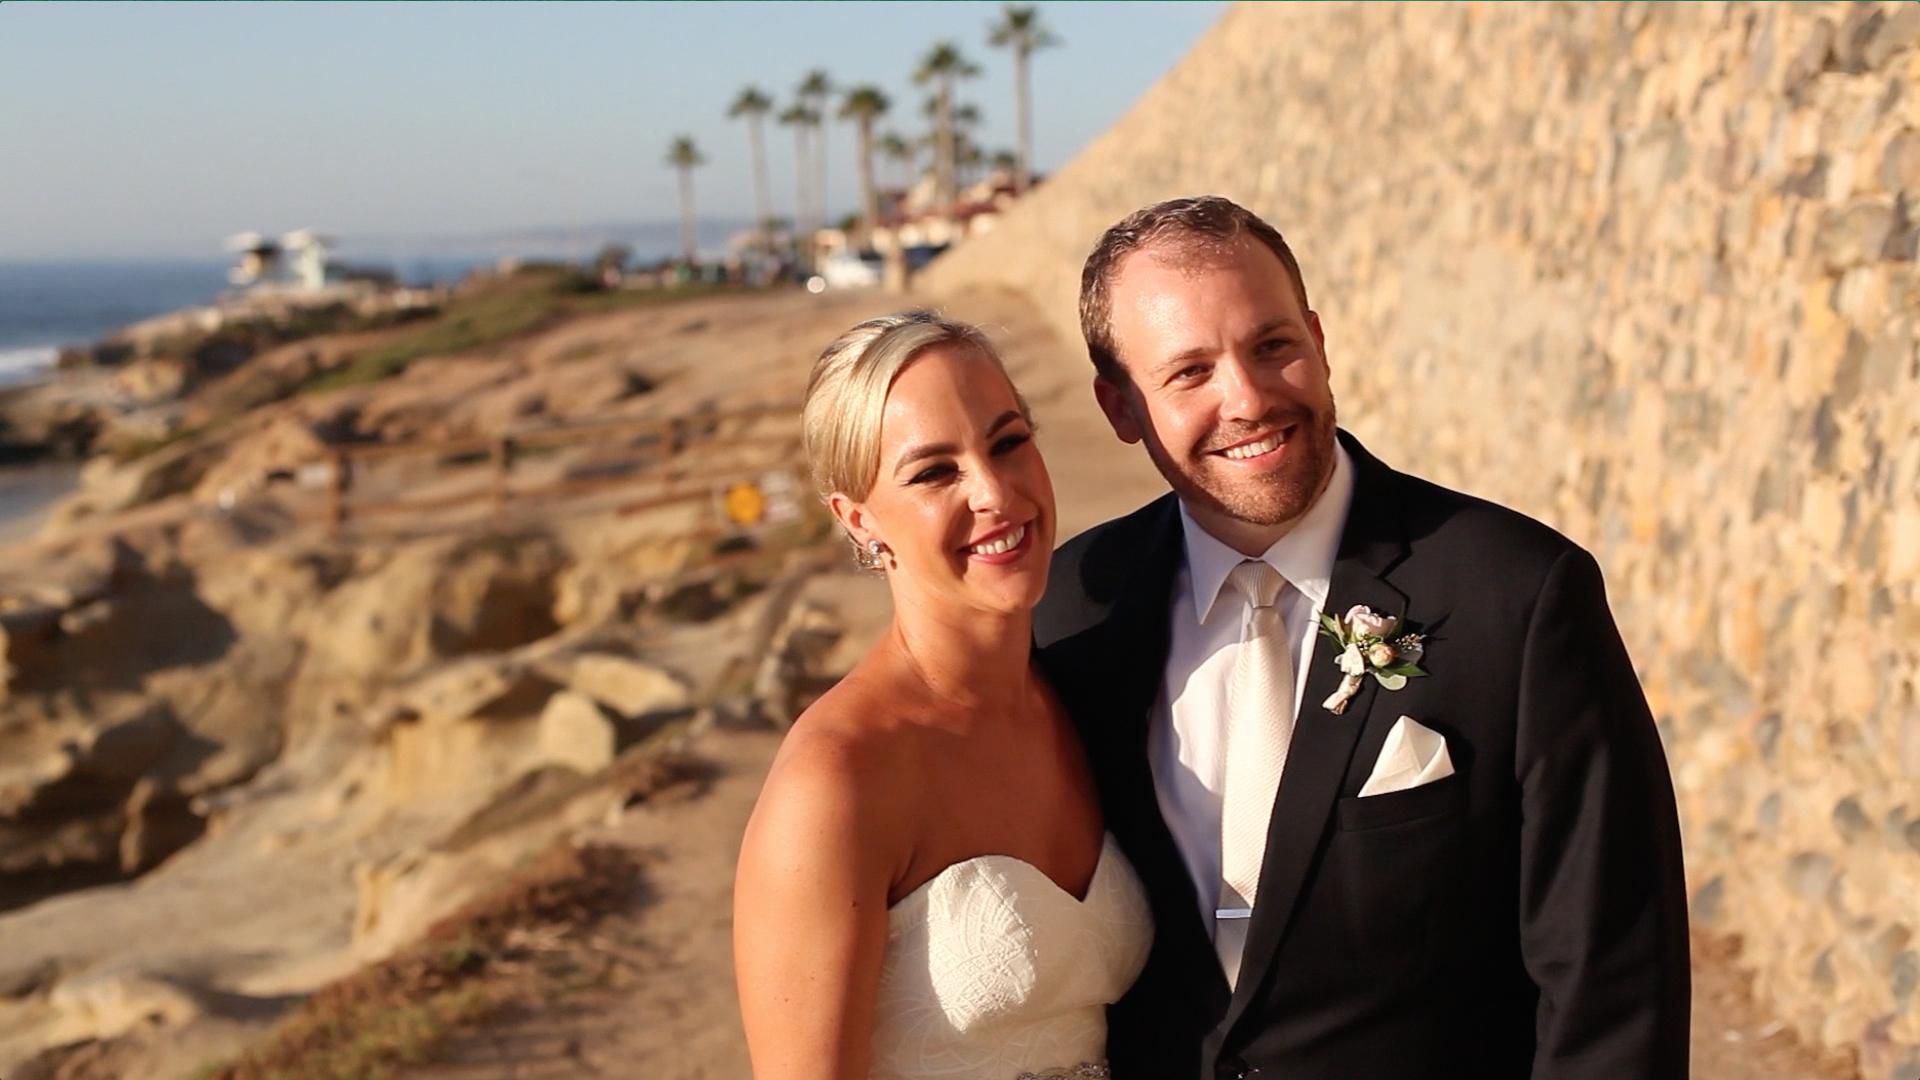 Beautiful Wedding in sunny San Diego / La Jolla California